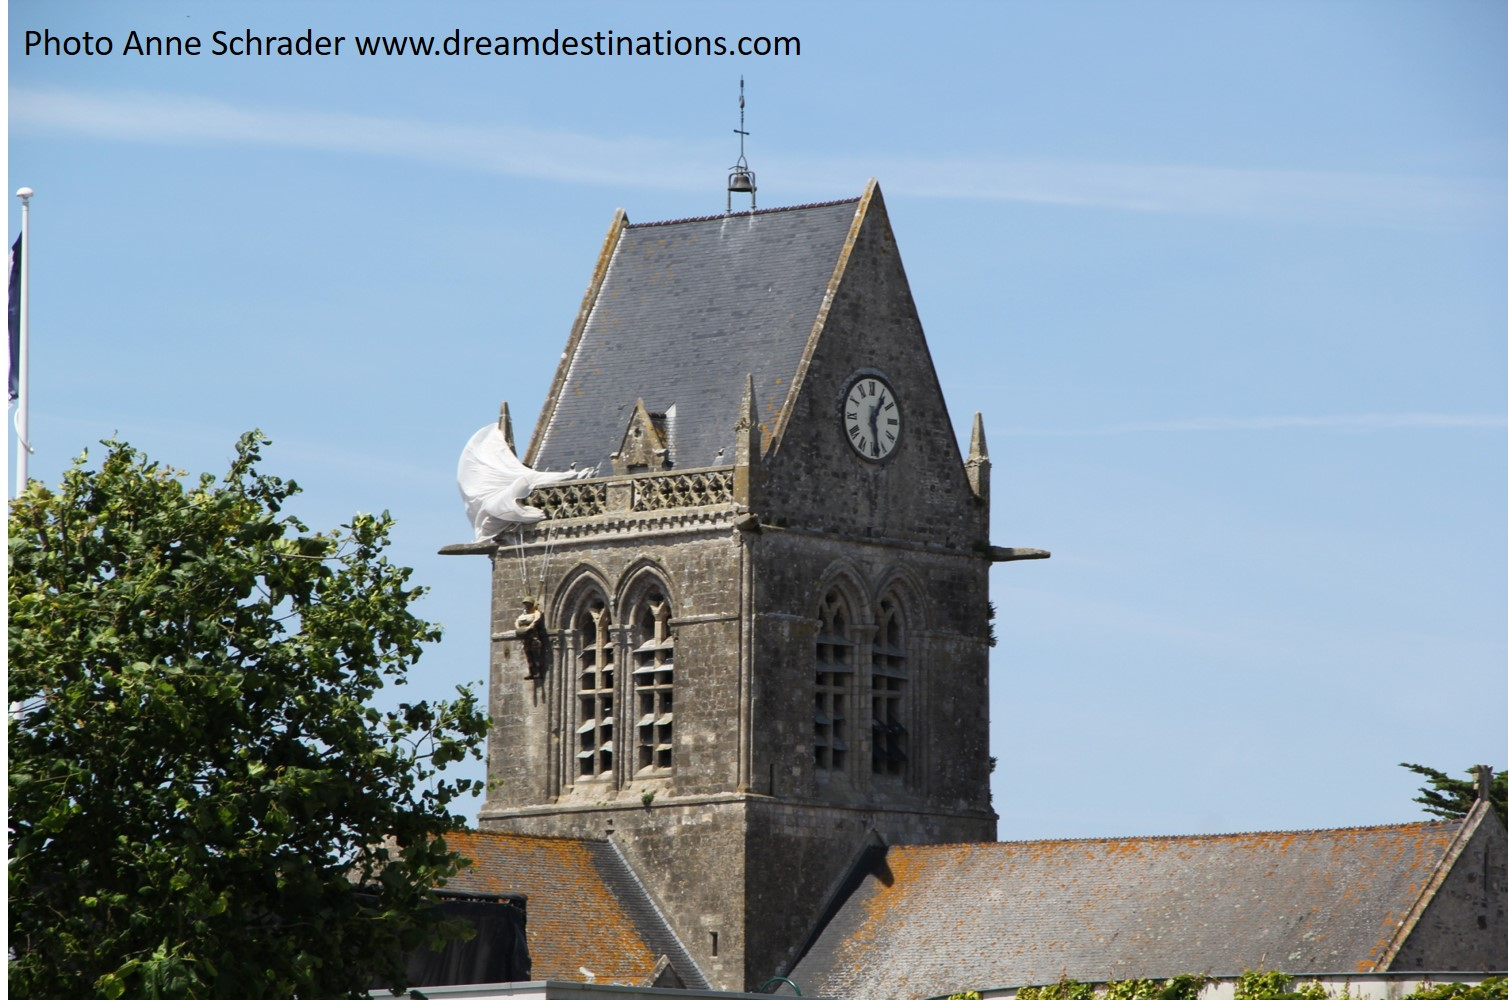 Ste. Mere Eglise 2014